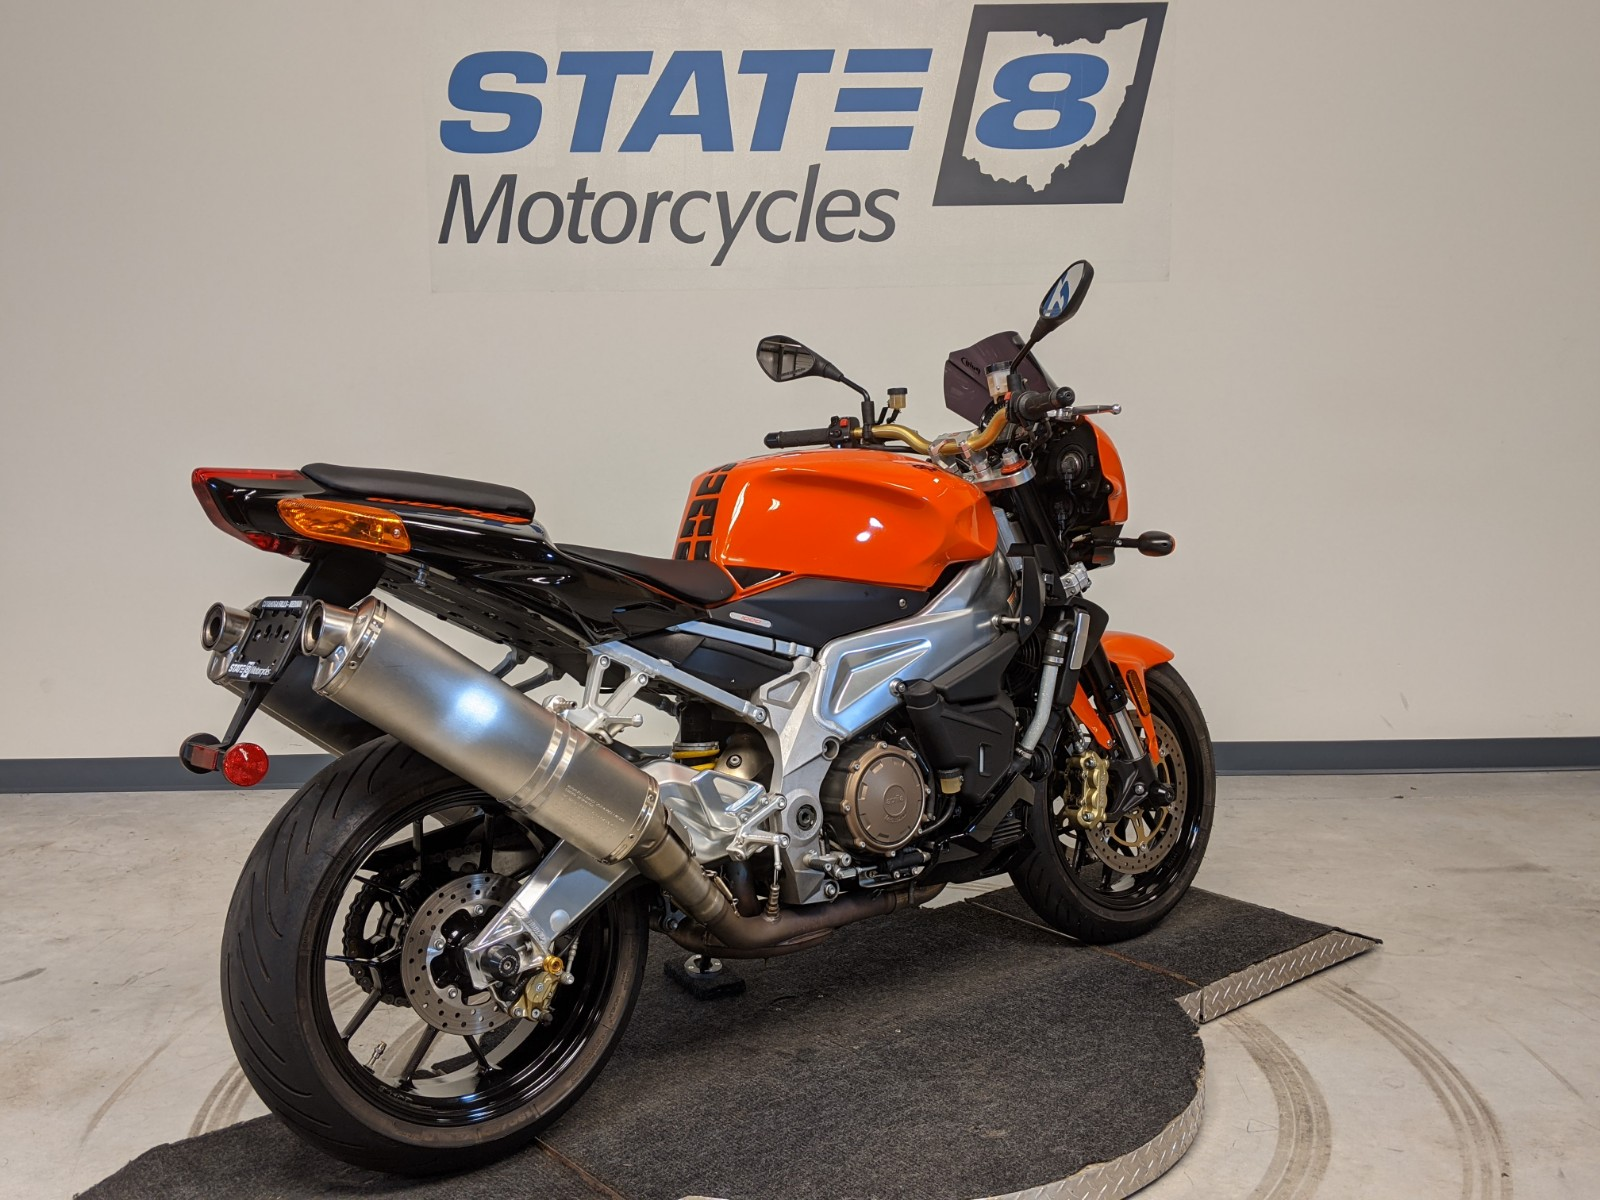 2009 Aprilia Tuono 1000r For Sale In Peninsula Oh State 8 Motorcycles